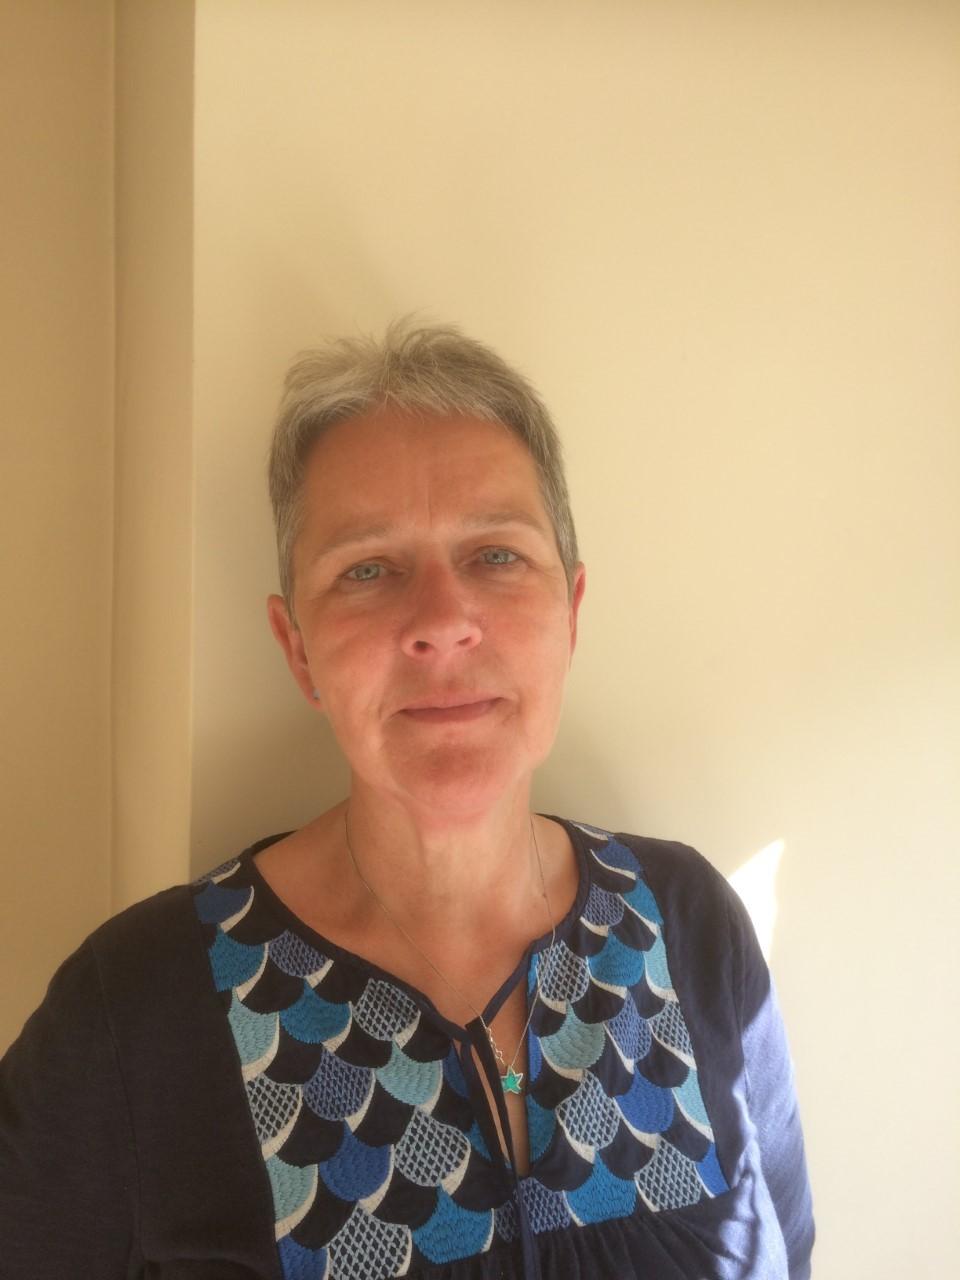 Denise Sturges-Allard